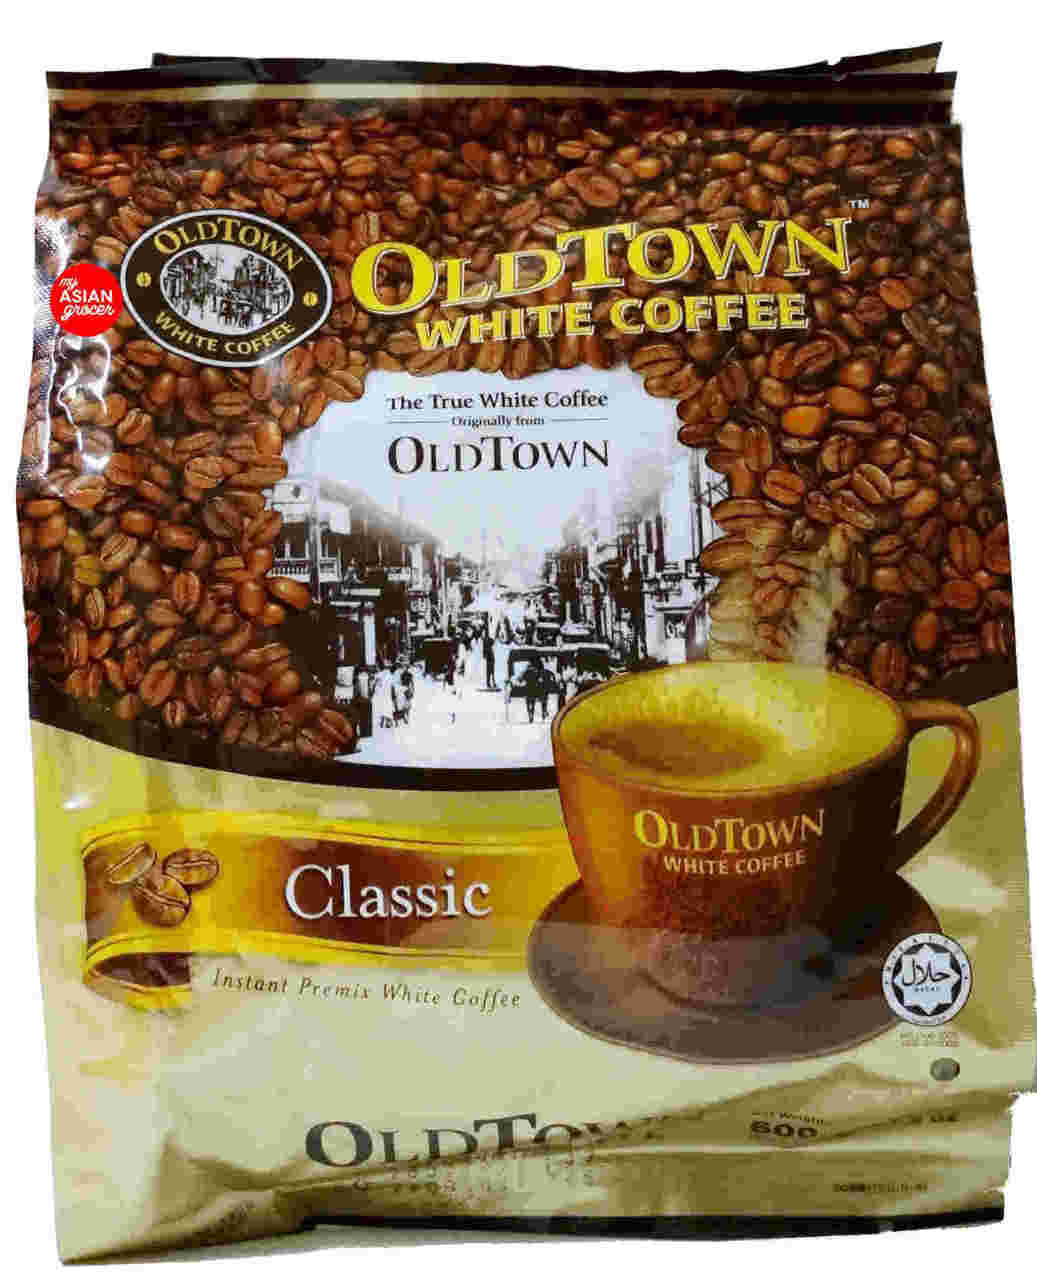 Old Town White Coffee Classic 38g x 15 Sticks